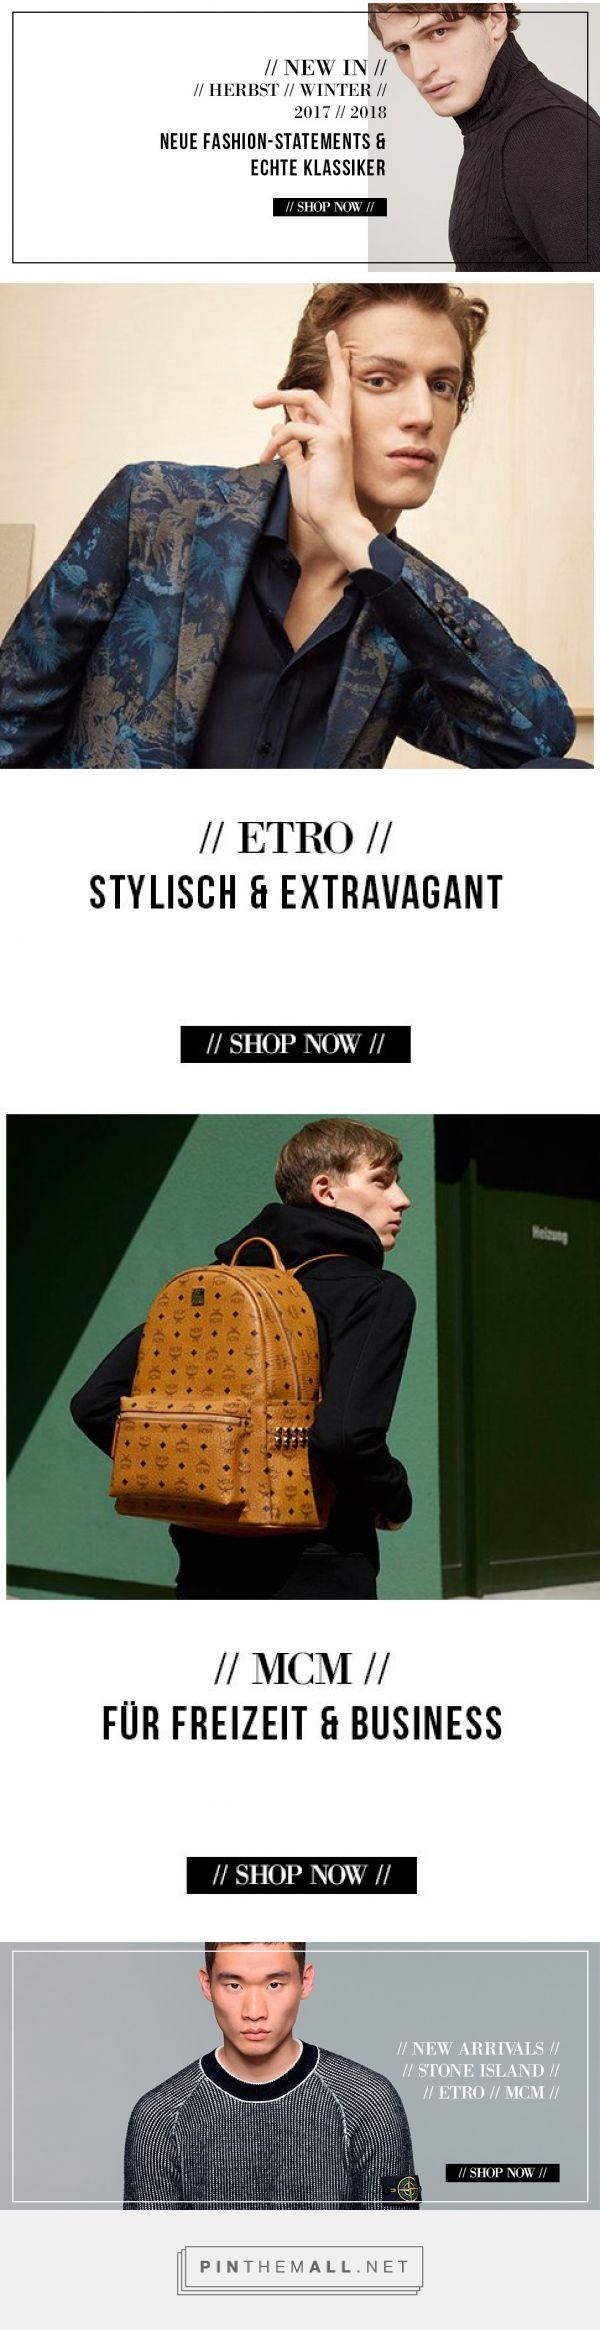 SAILERstyle.com | Designer Herrenmode & Skiwear - Online Shop - created via https://pinthemall.net